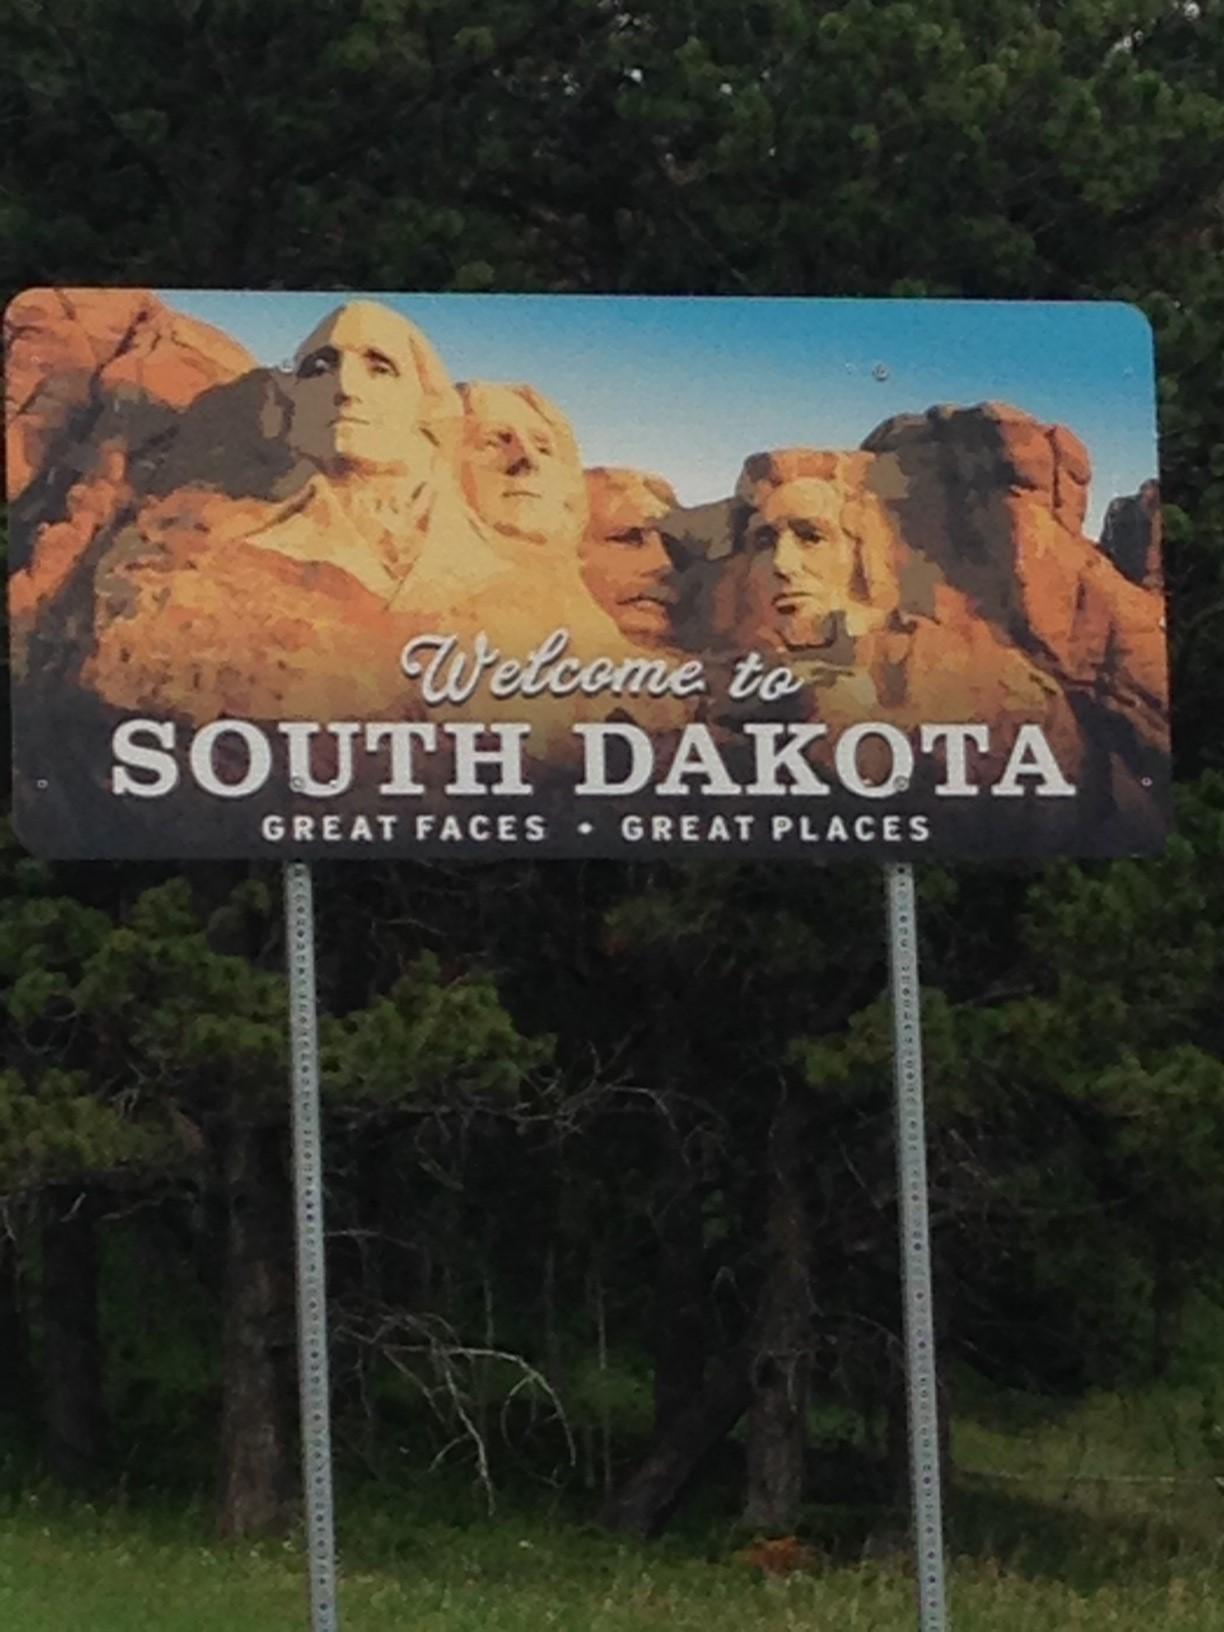 Best Summer Street Style: The BEST Summer Vacation~ South Dakota-Wyoming